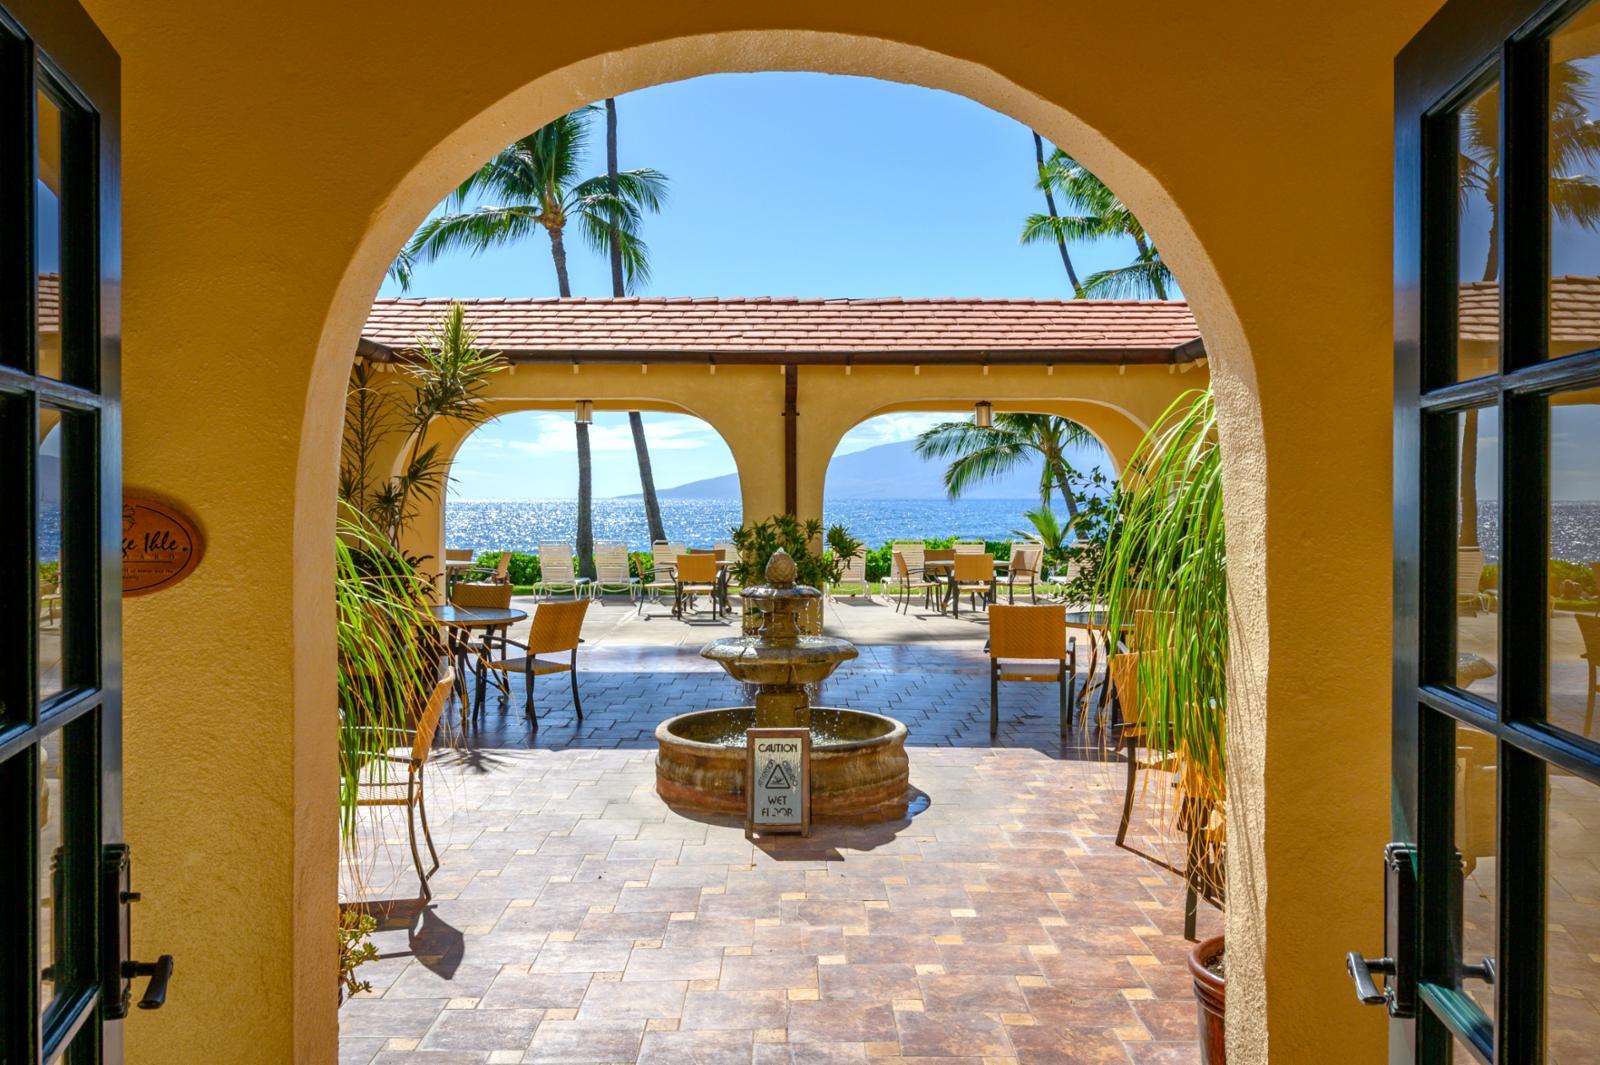 Puamana courtyard has stunning views!